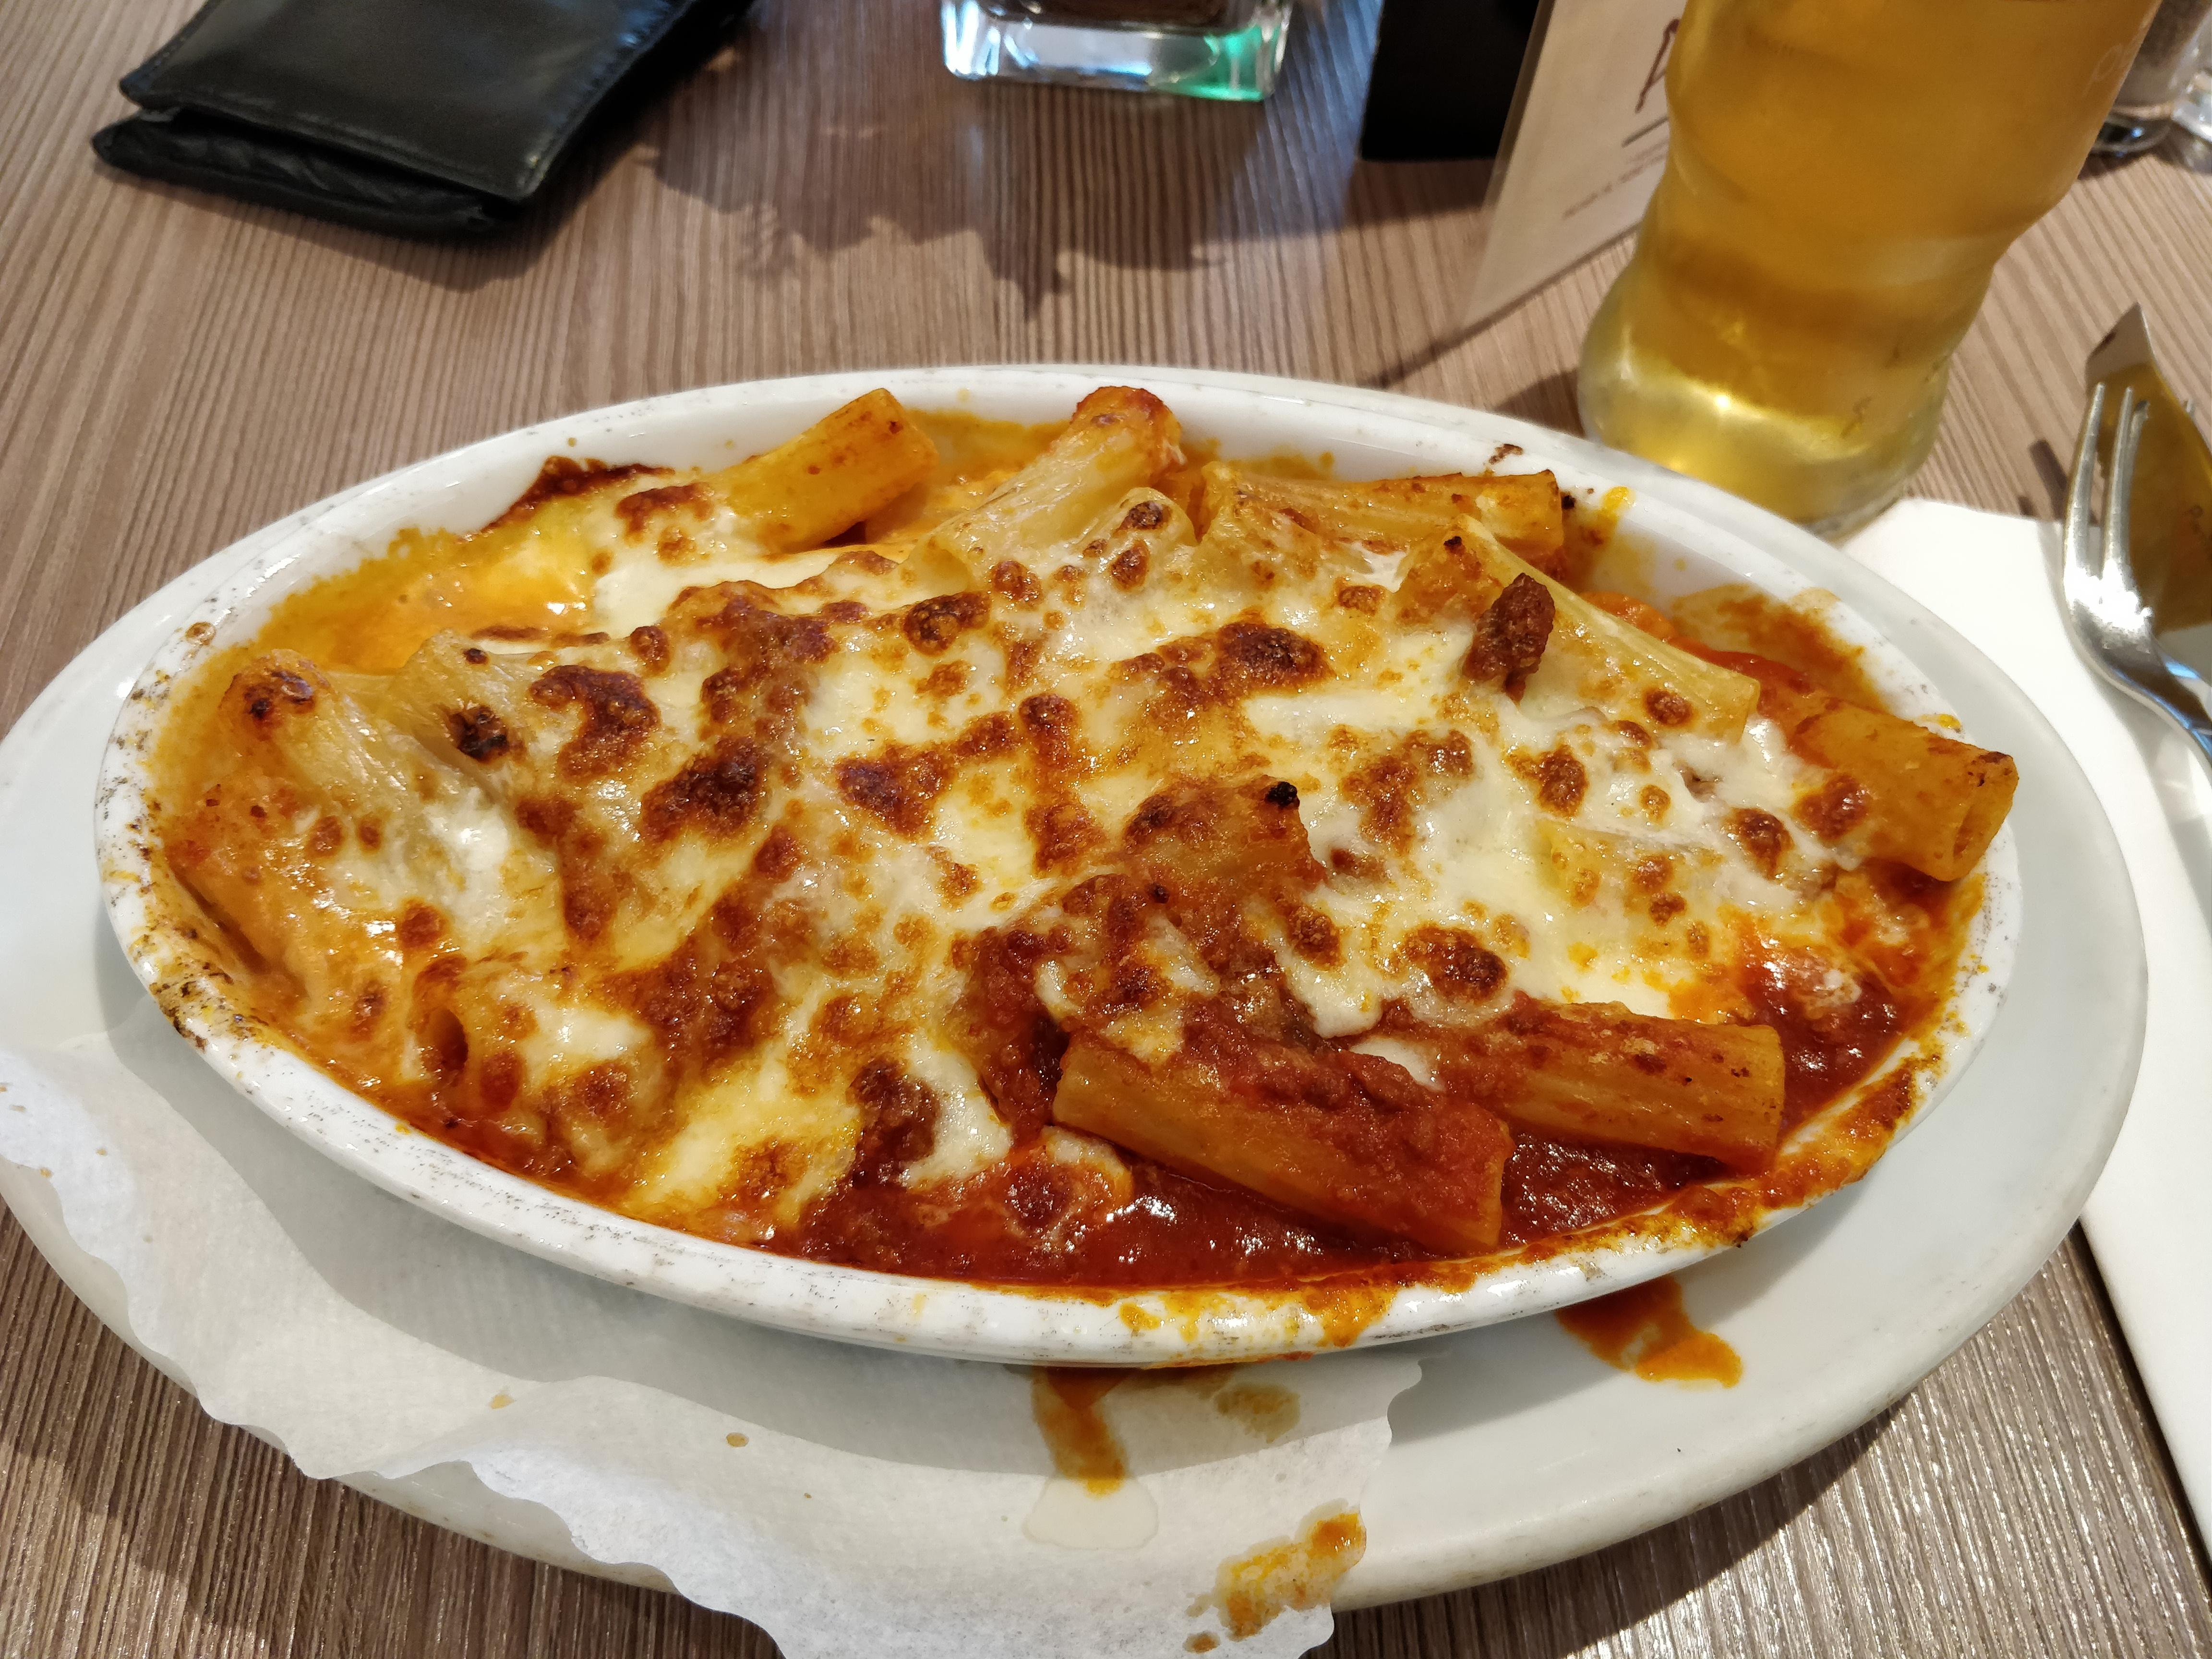 https://foodloader.net/nico_2018-10-13_rigatoni-al-forno.jpg